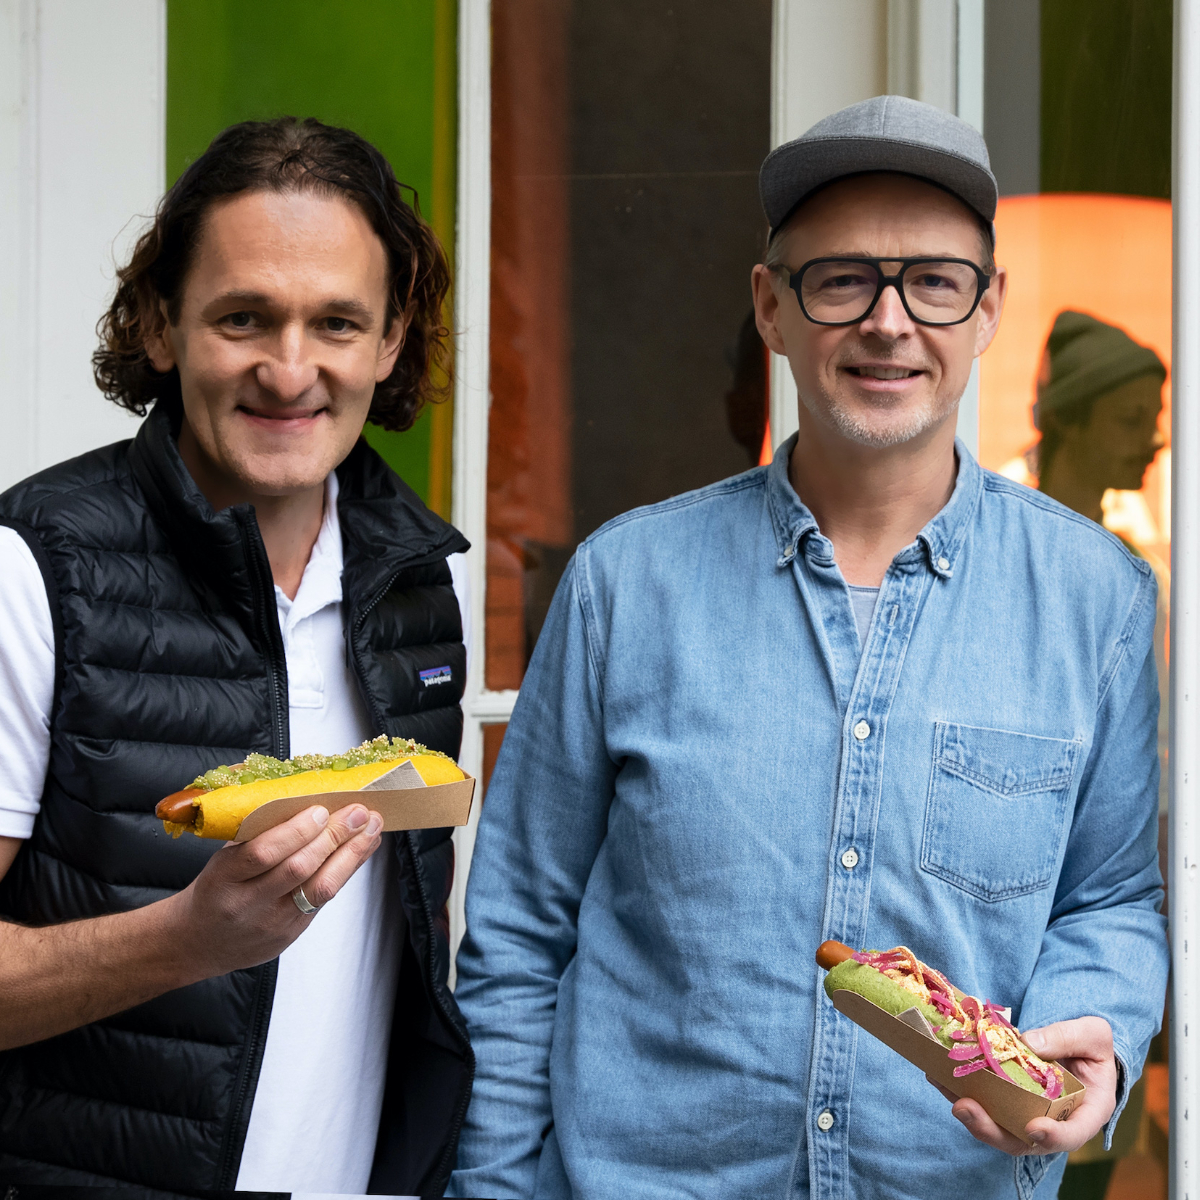 Organic Garden Gourmet Hotdog Muenchen (1)